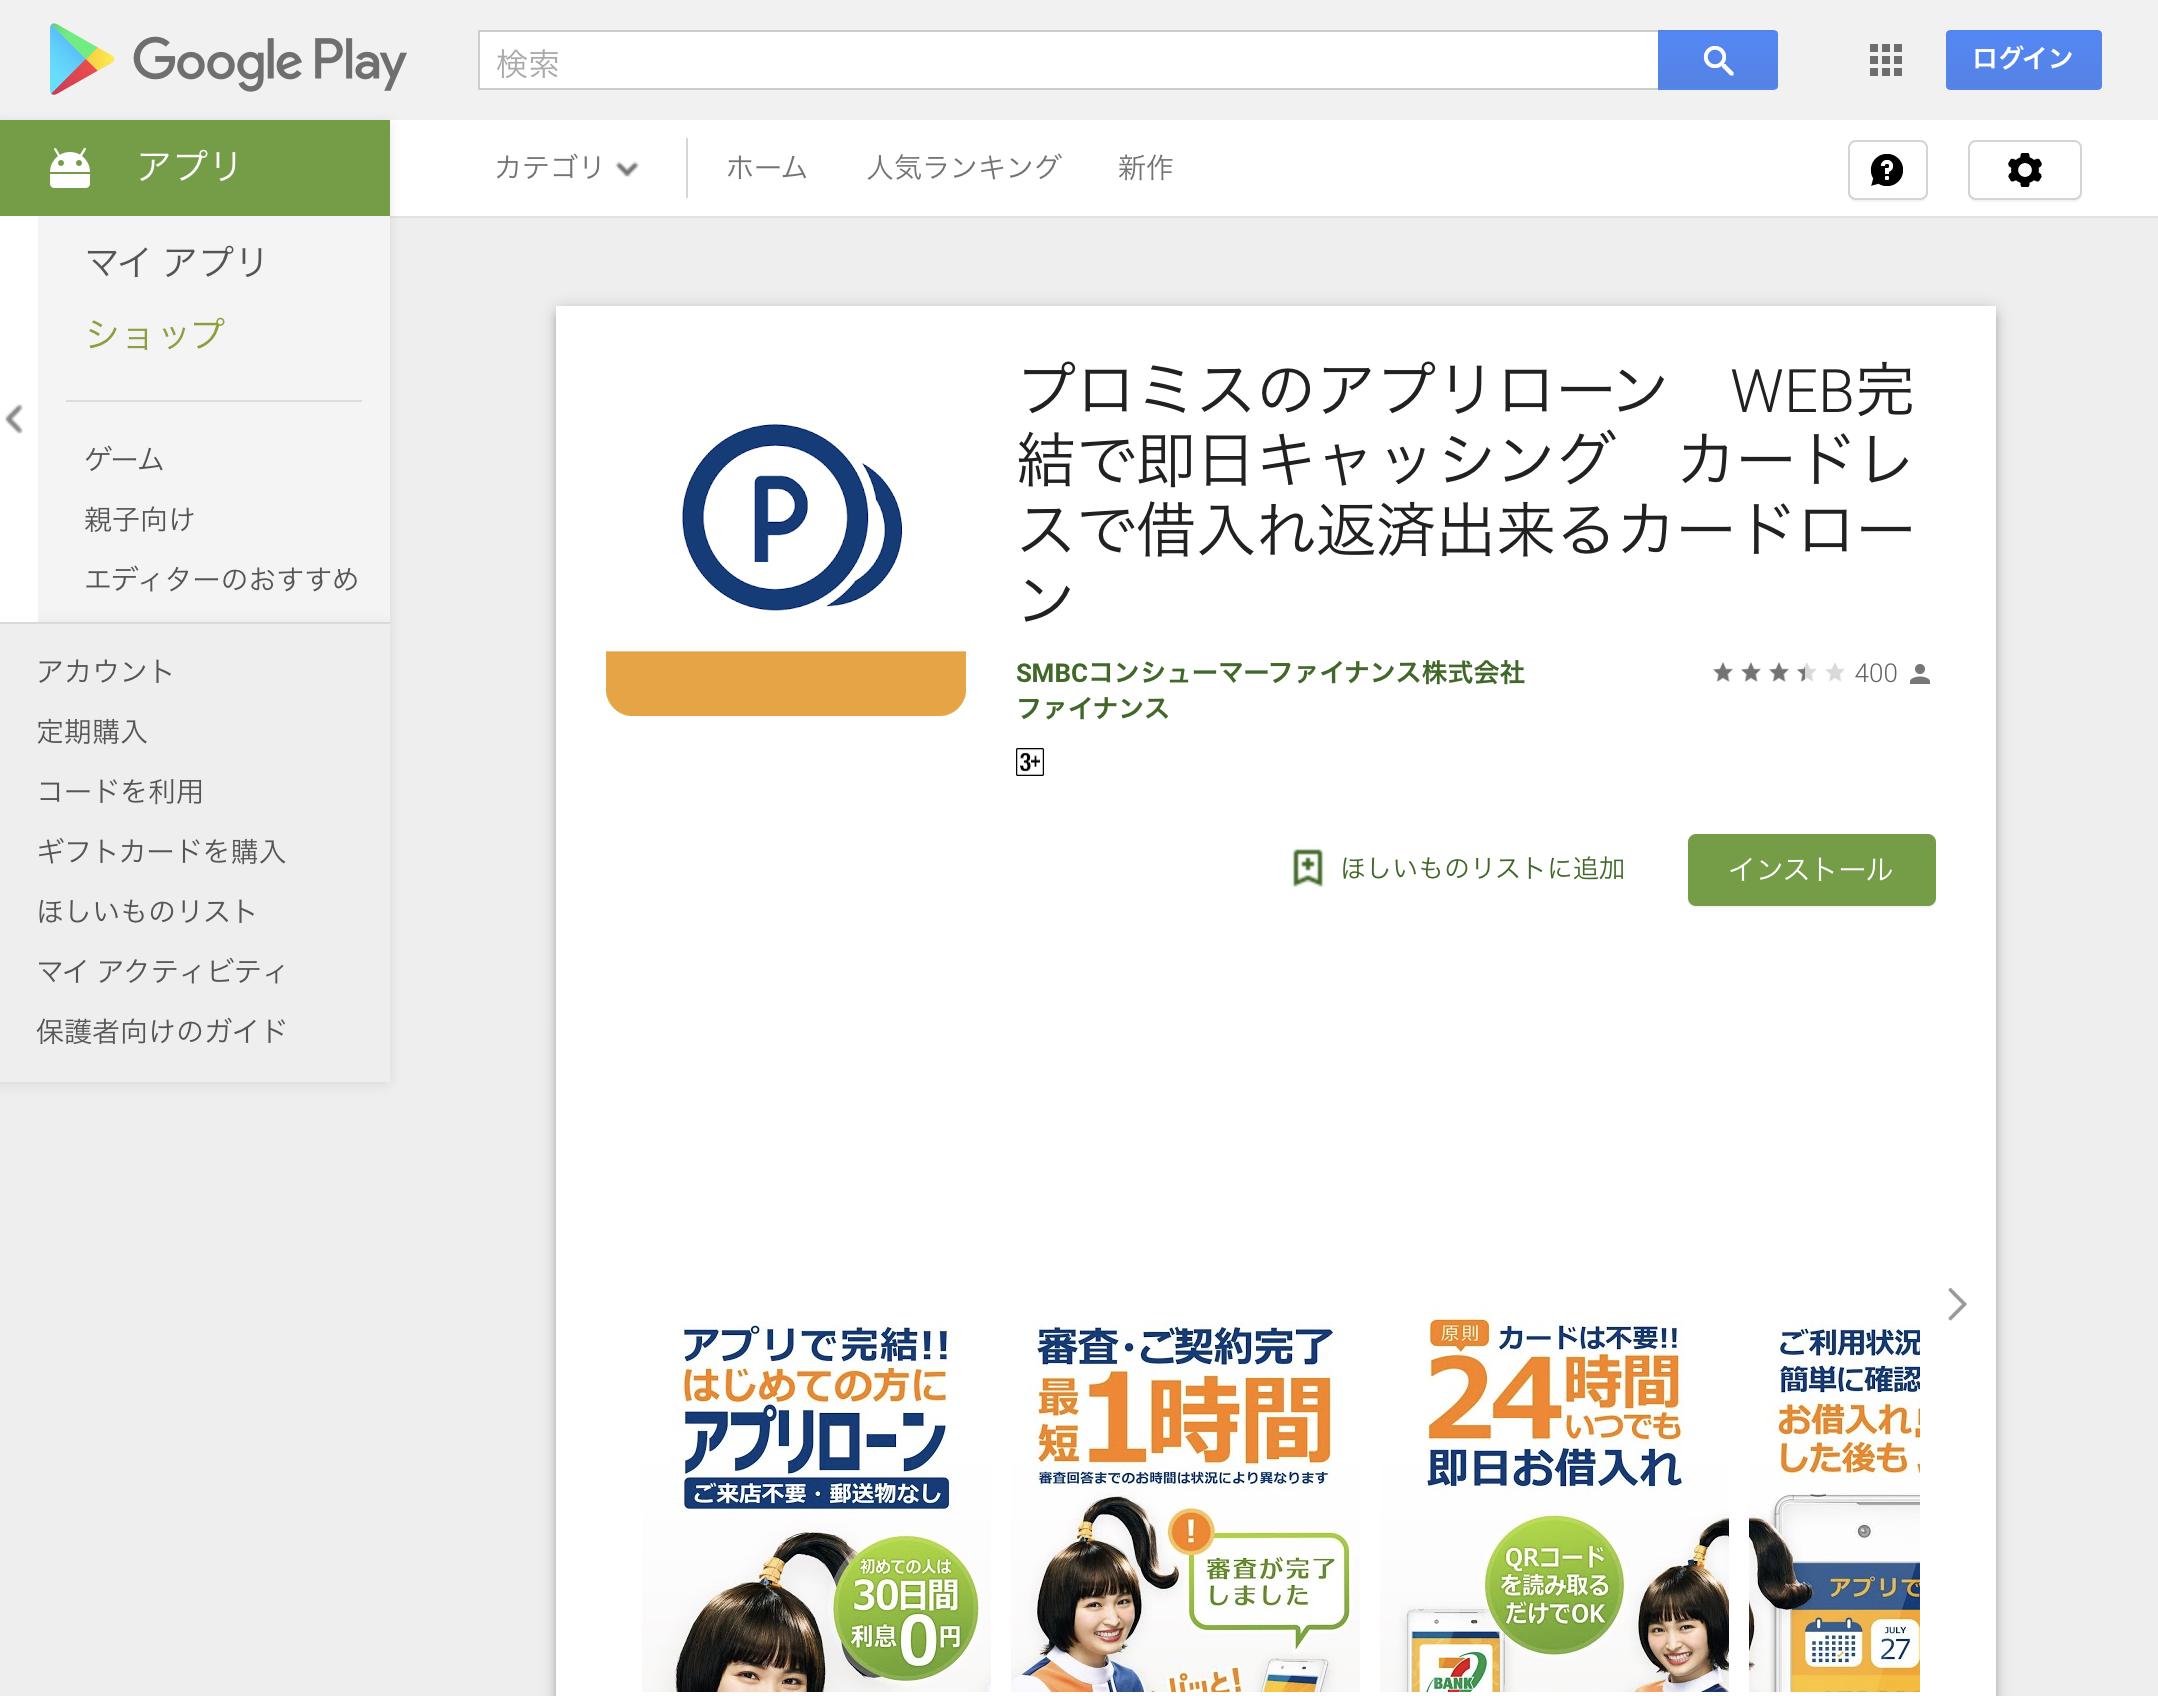 Android版(Google Play)のプロミスアプリを紹介・インストールするための画面